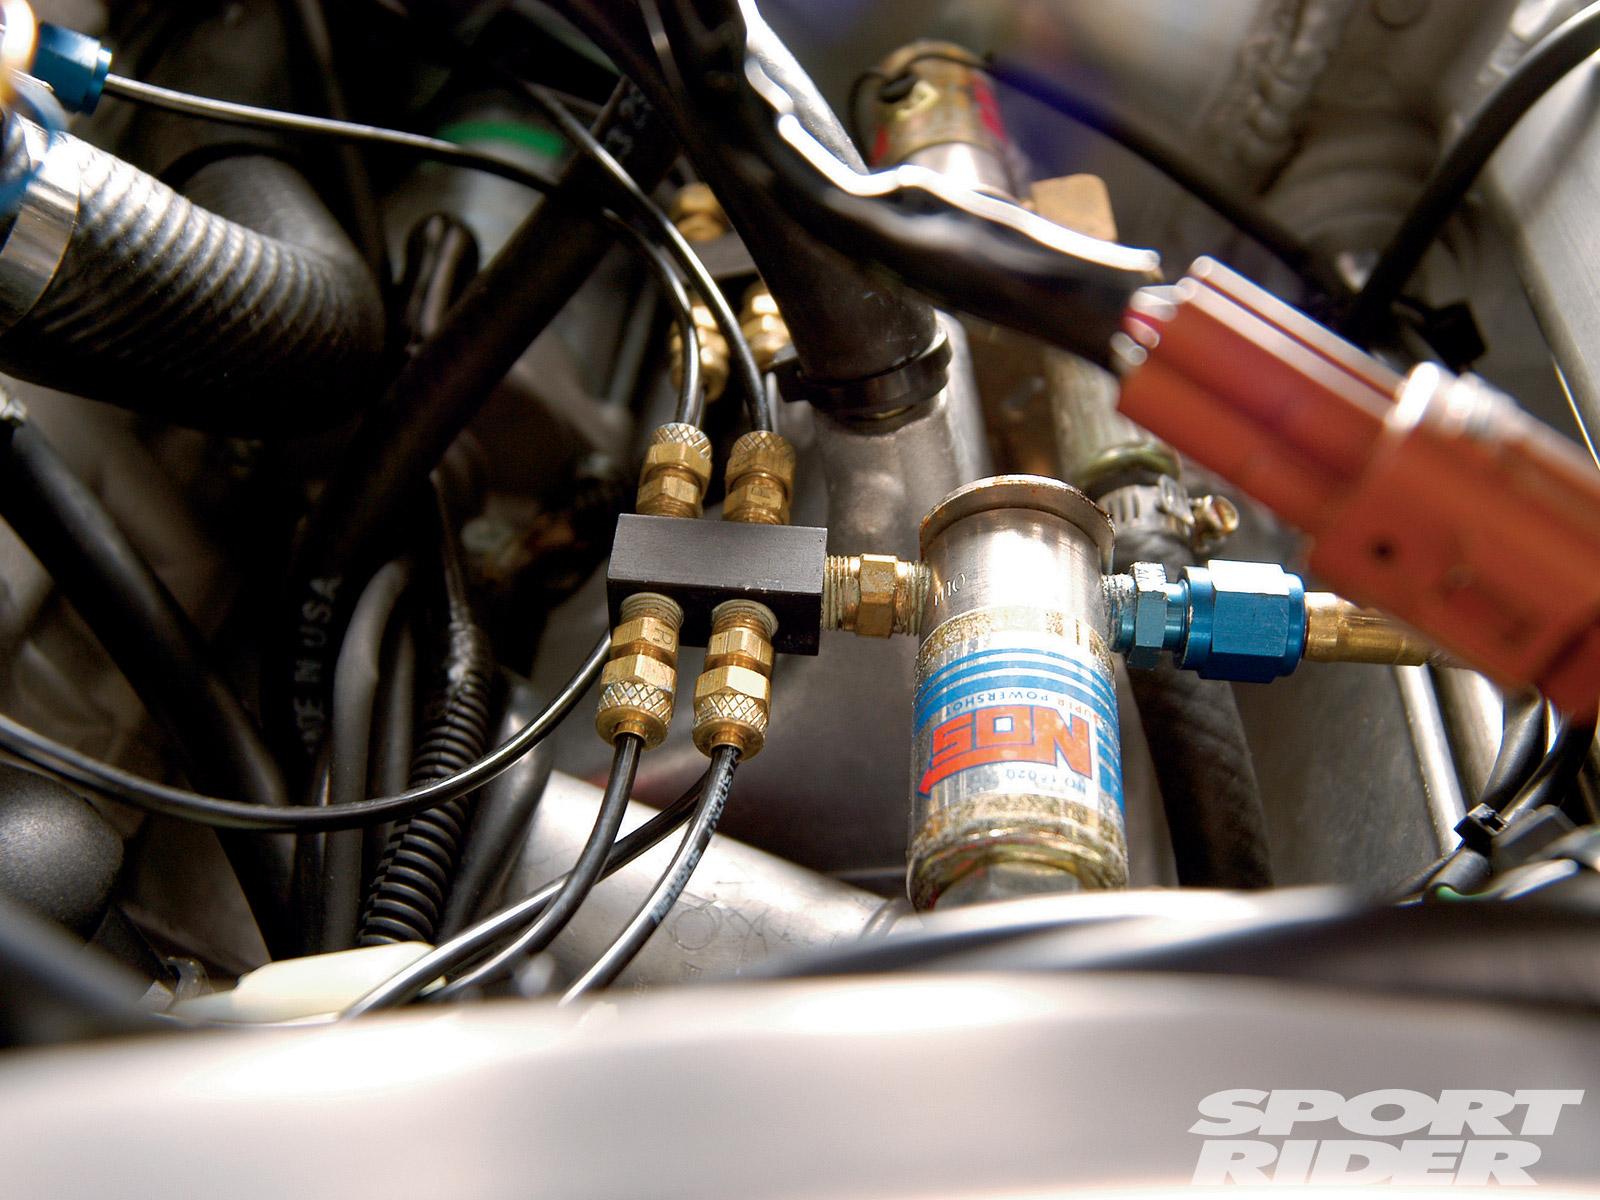 Suzuki Jet Sport 4 50 X 5 NOS Nitrous Oxide Kit /& Boost Bottle